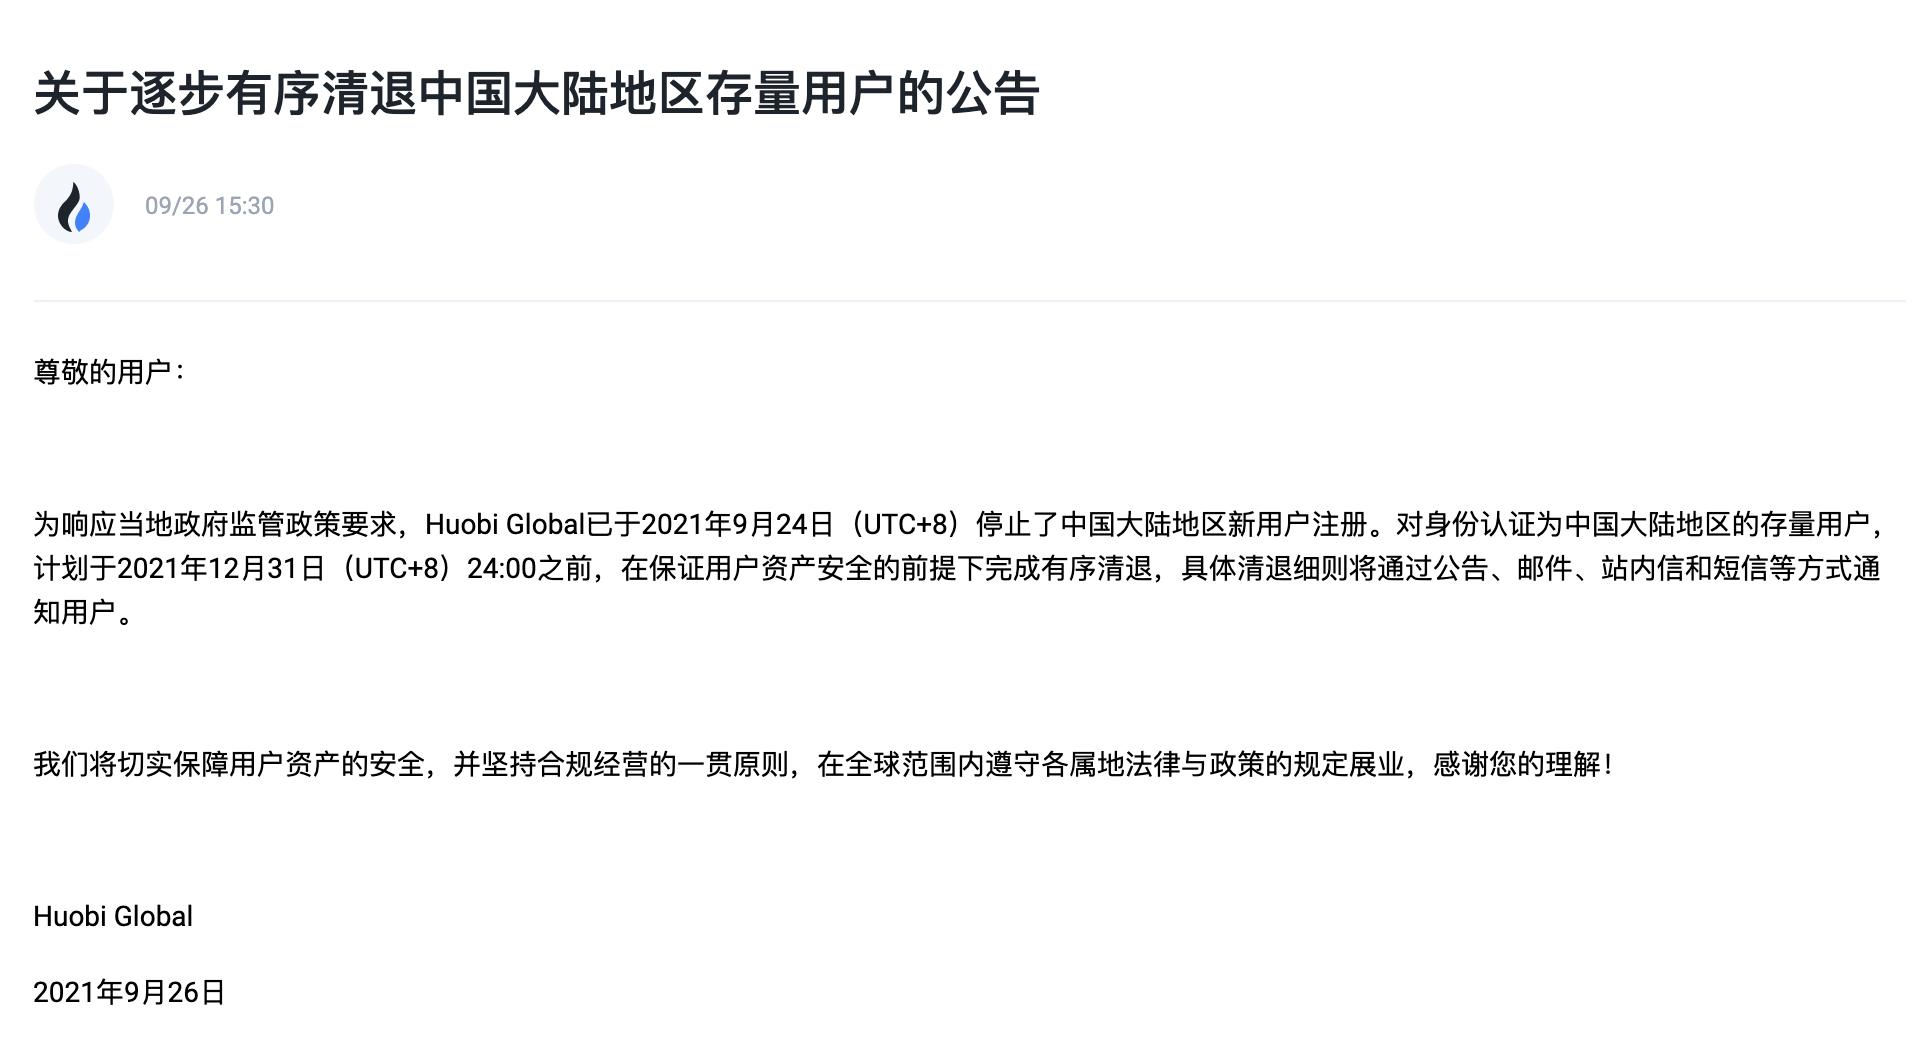 Huobi Global将在12月31日之前逐步有序清退中国大陆地区存量用户